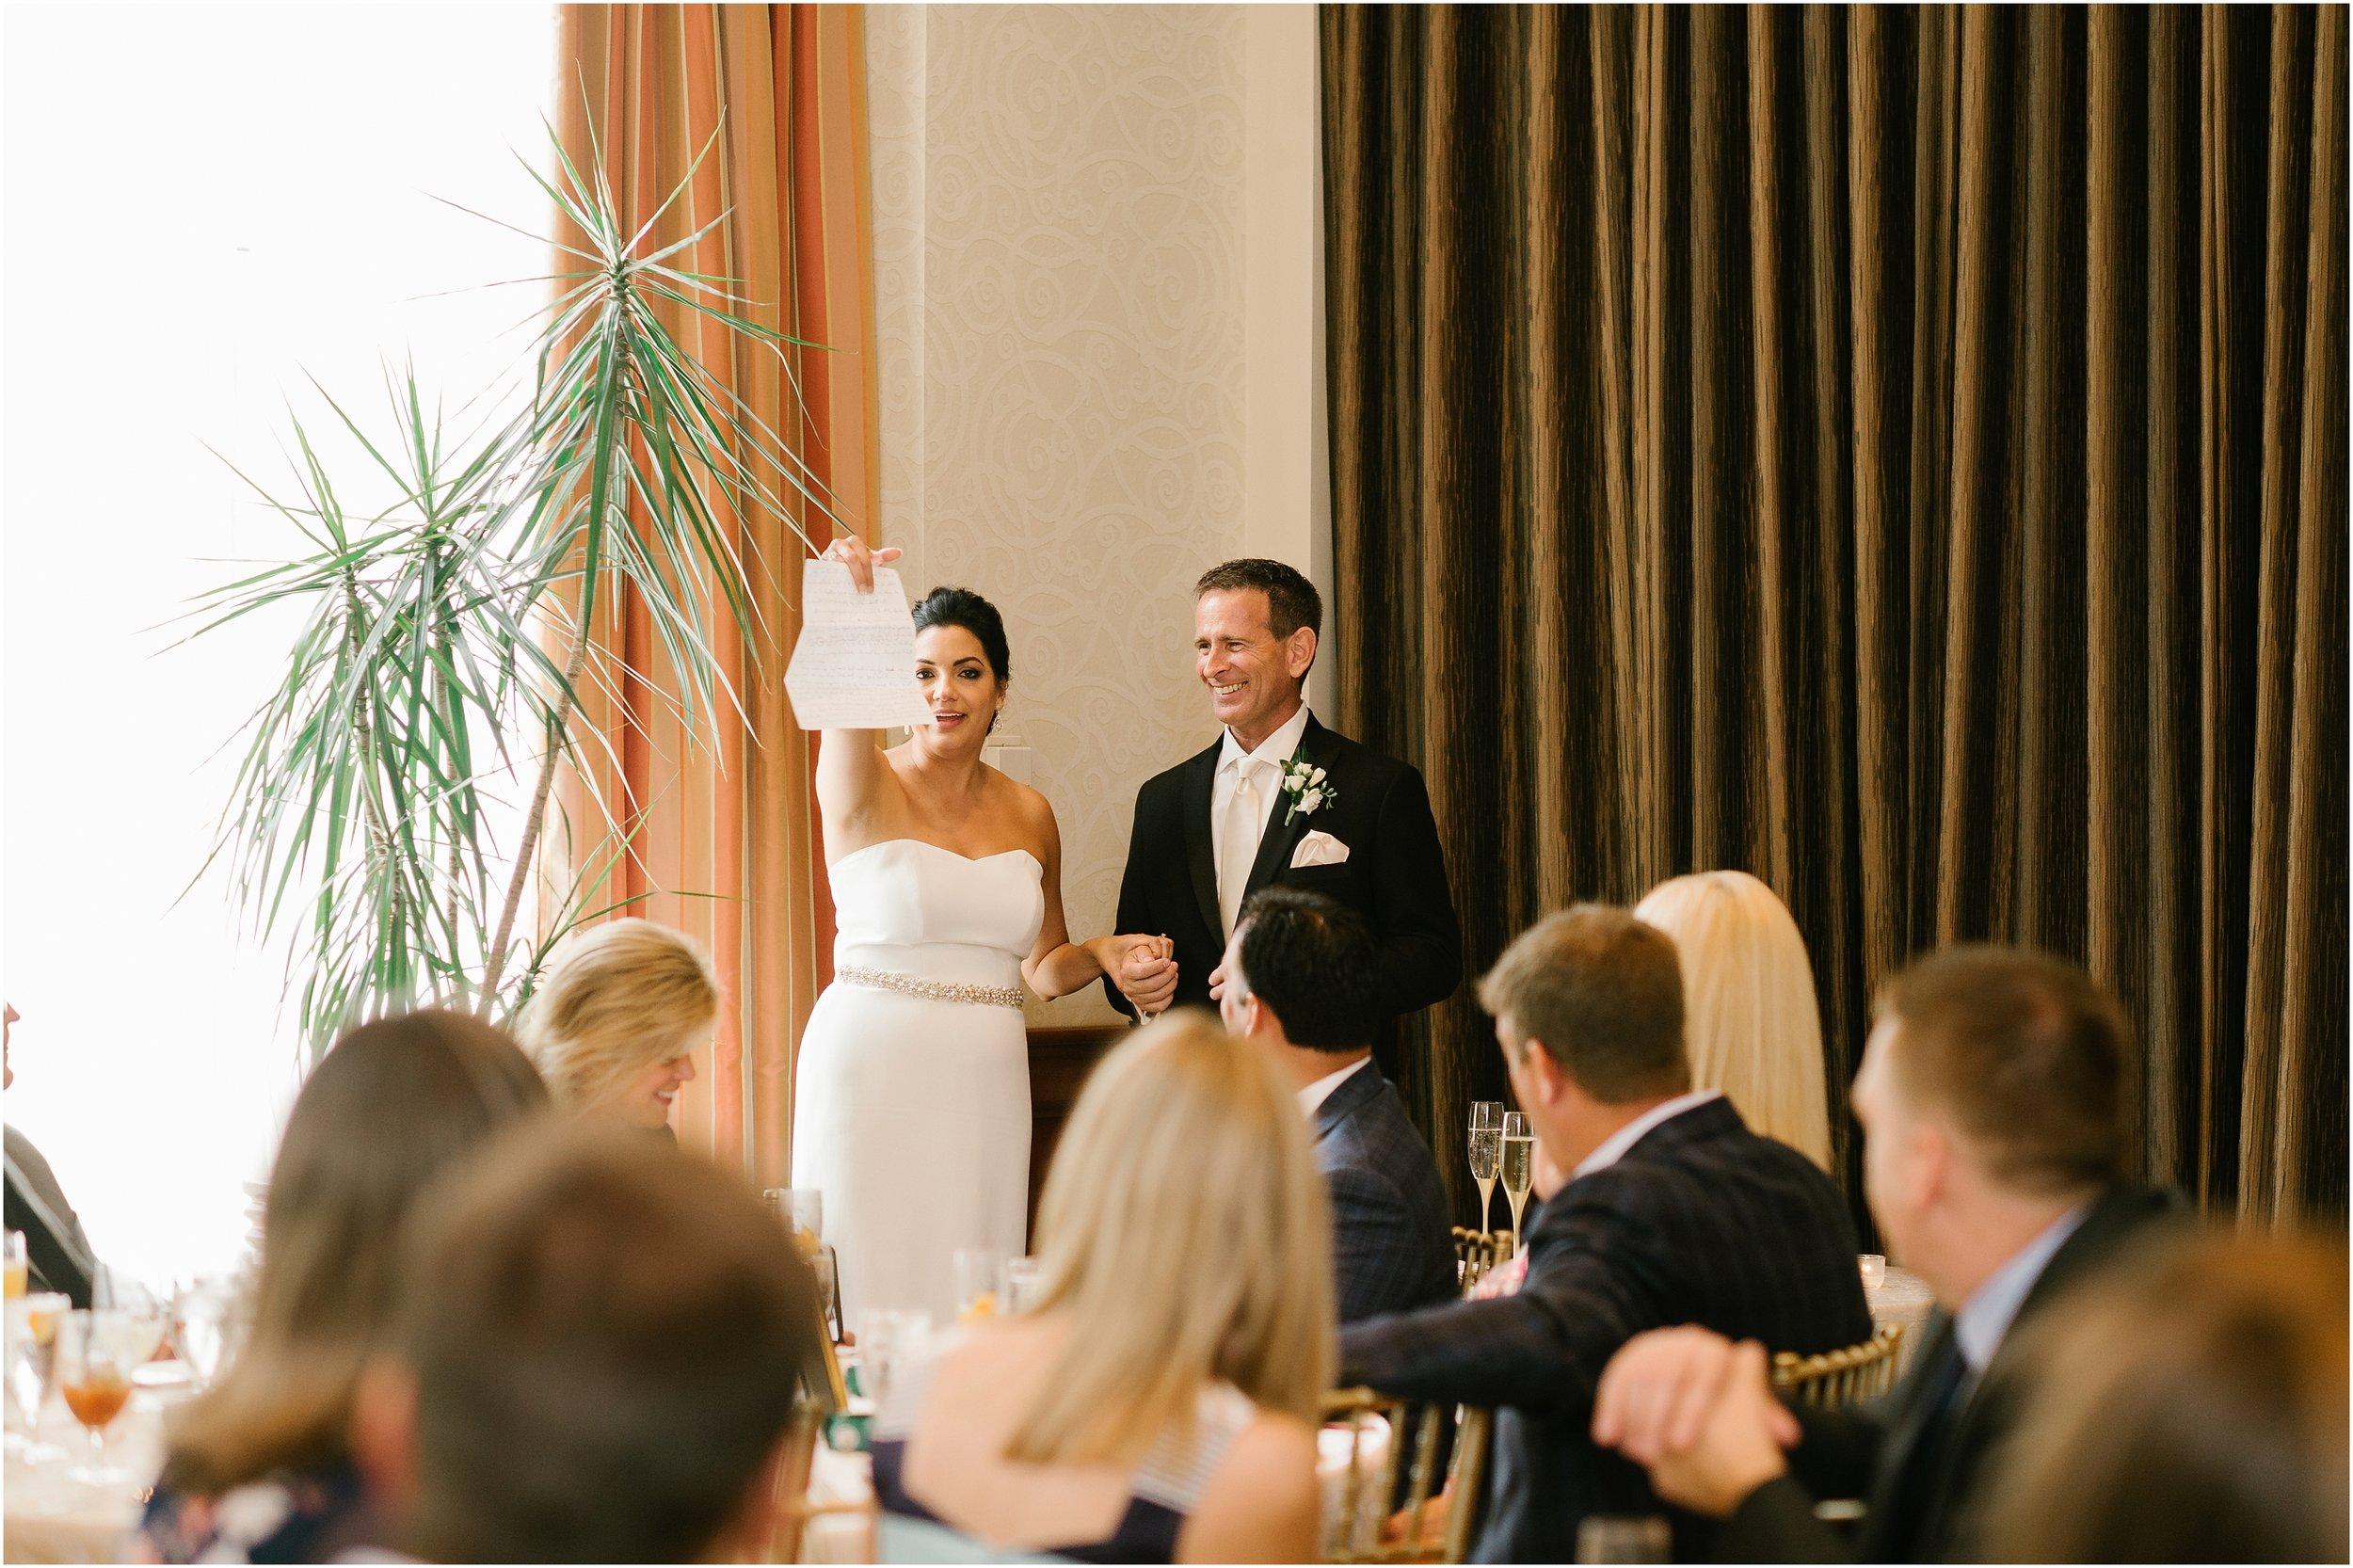 Rebecca_Shehorn_Photography_Indianapolis_Wedding_Photographer_8568.jpg